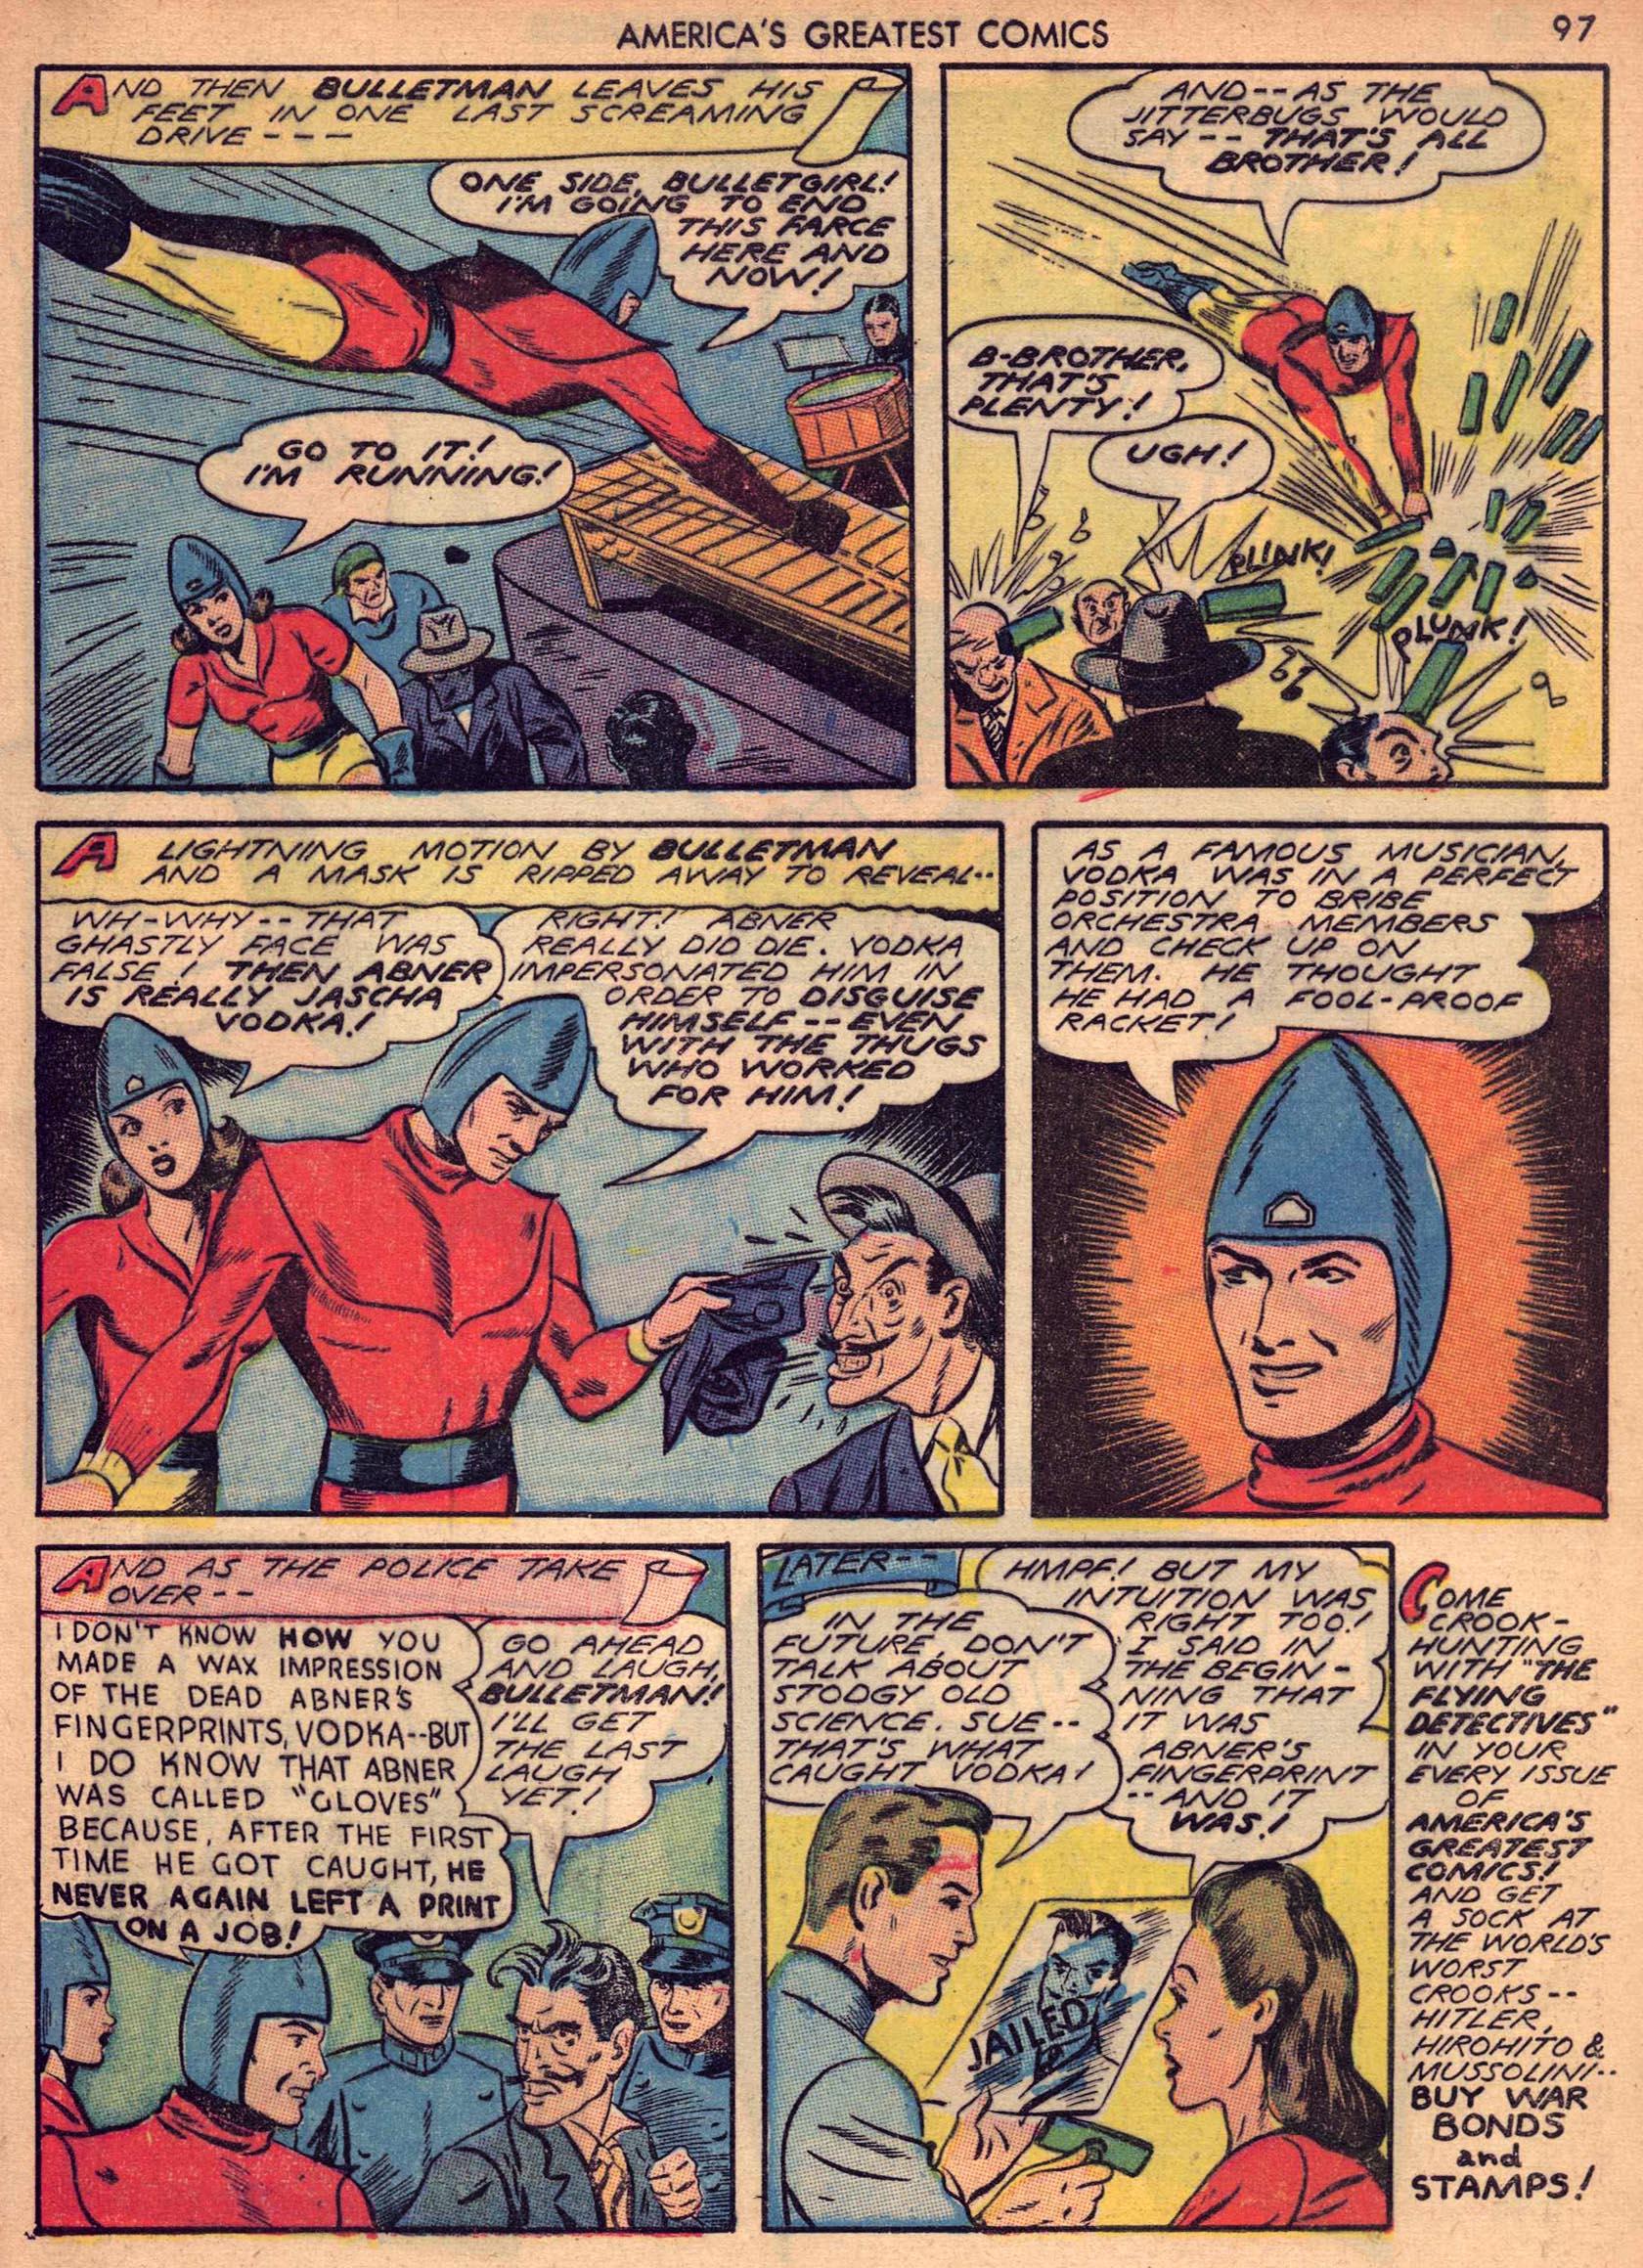 Read online America's Greatest Comics comic -  Issue #7 - 96